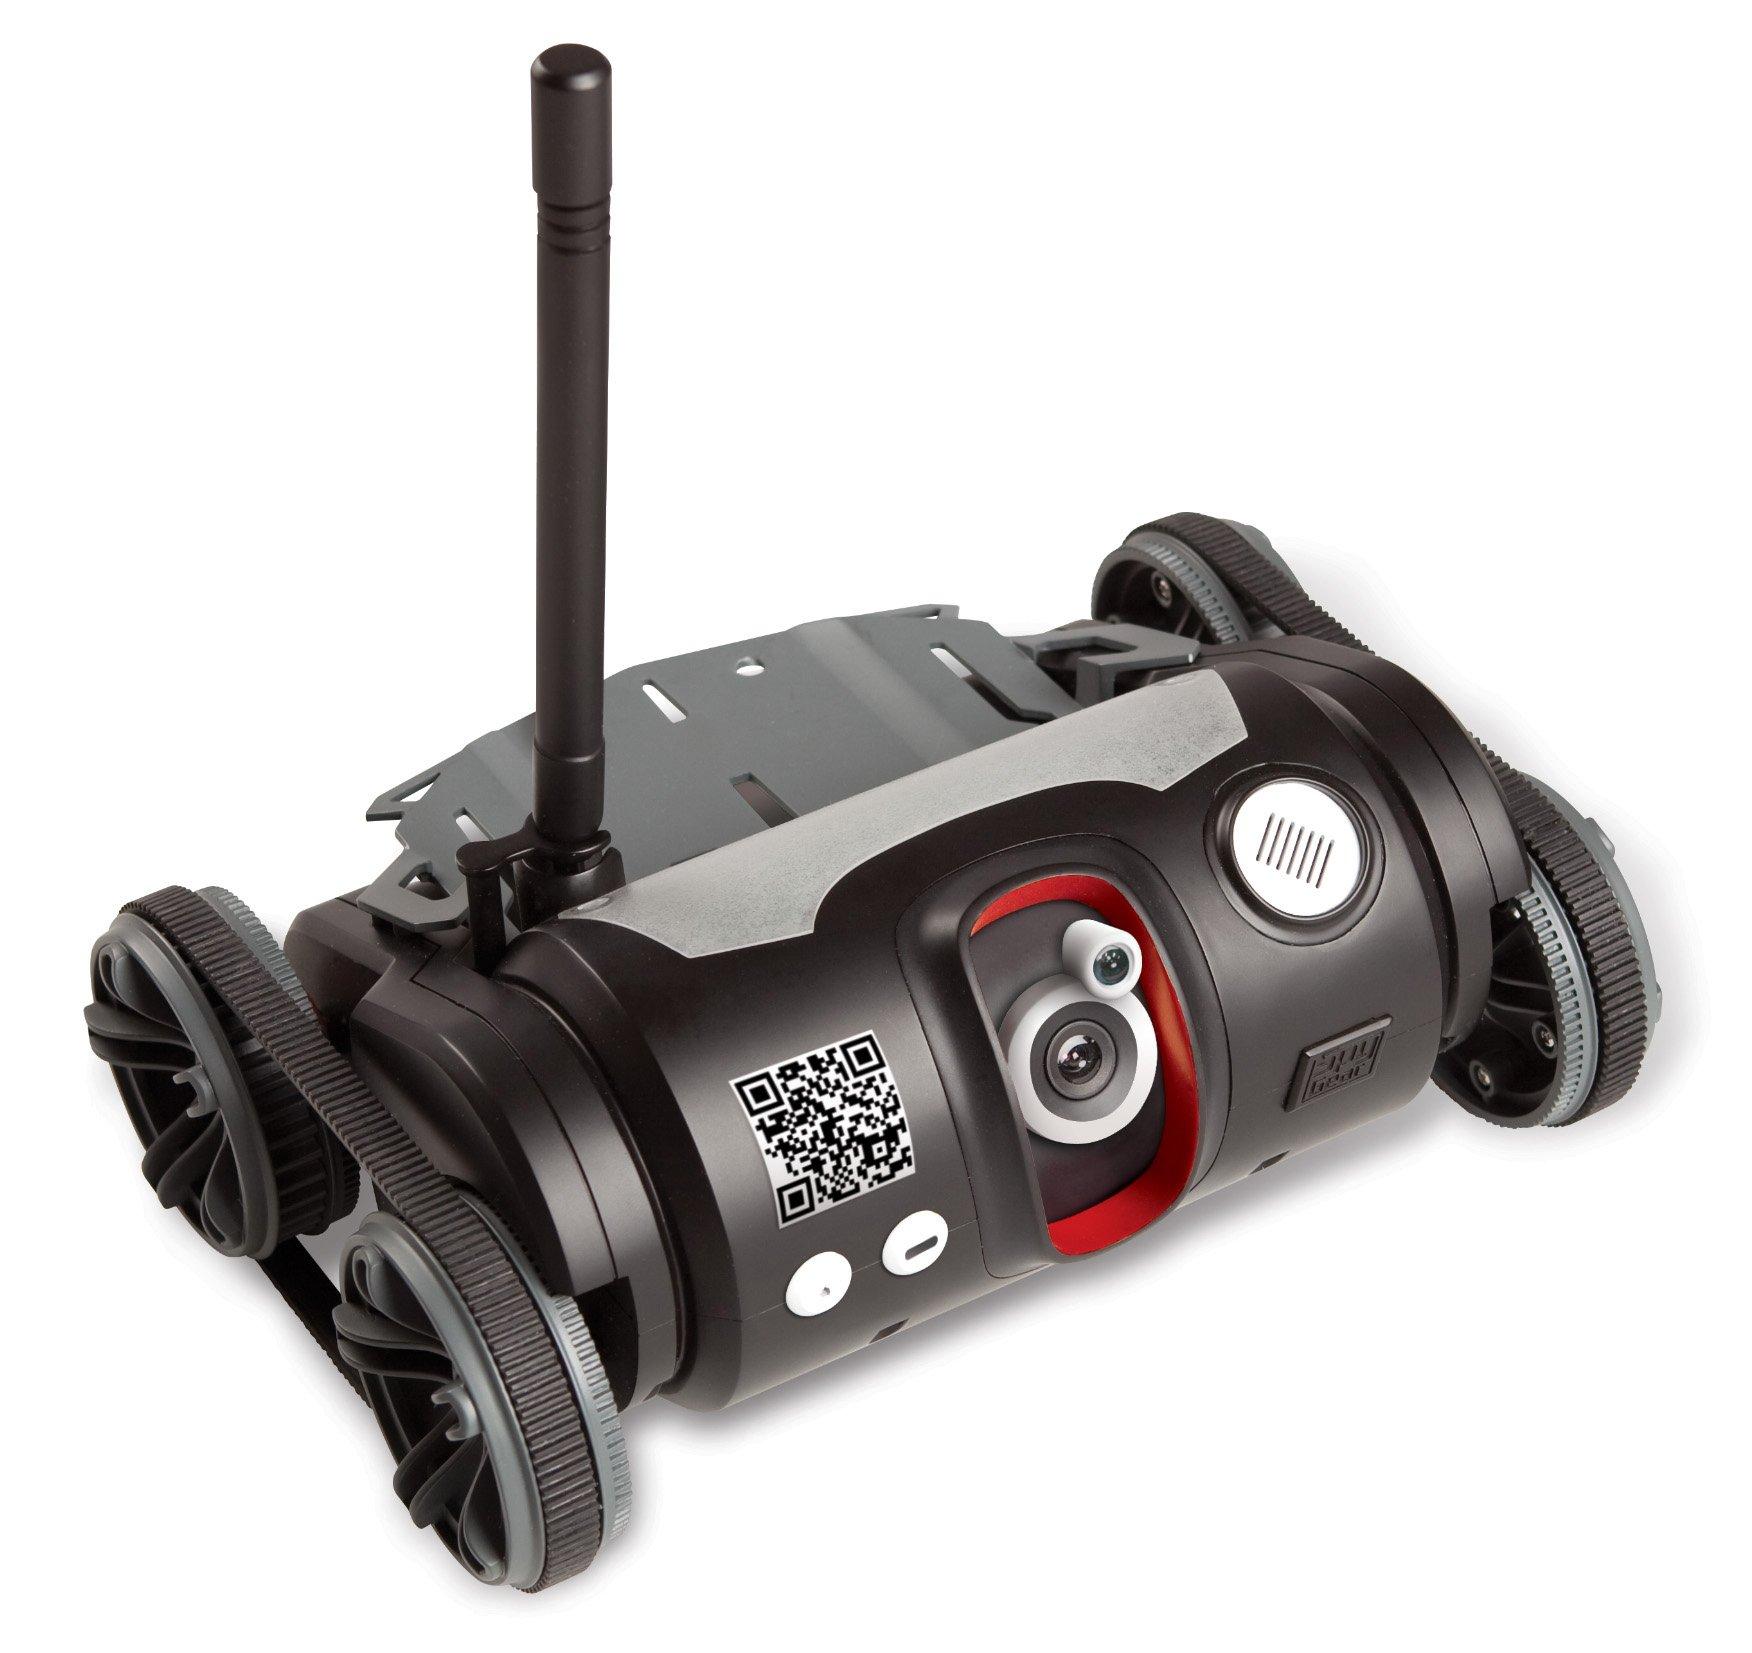 Spy Gear Spy Video TRAKR by Spy Gear